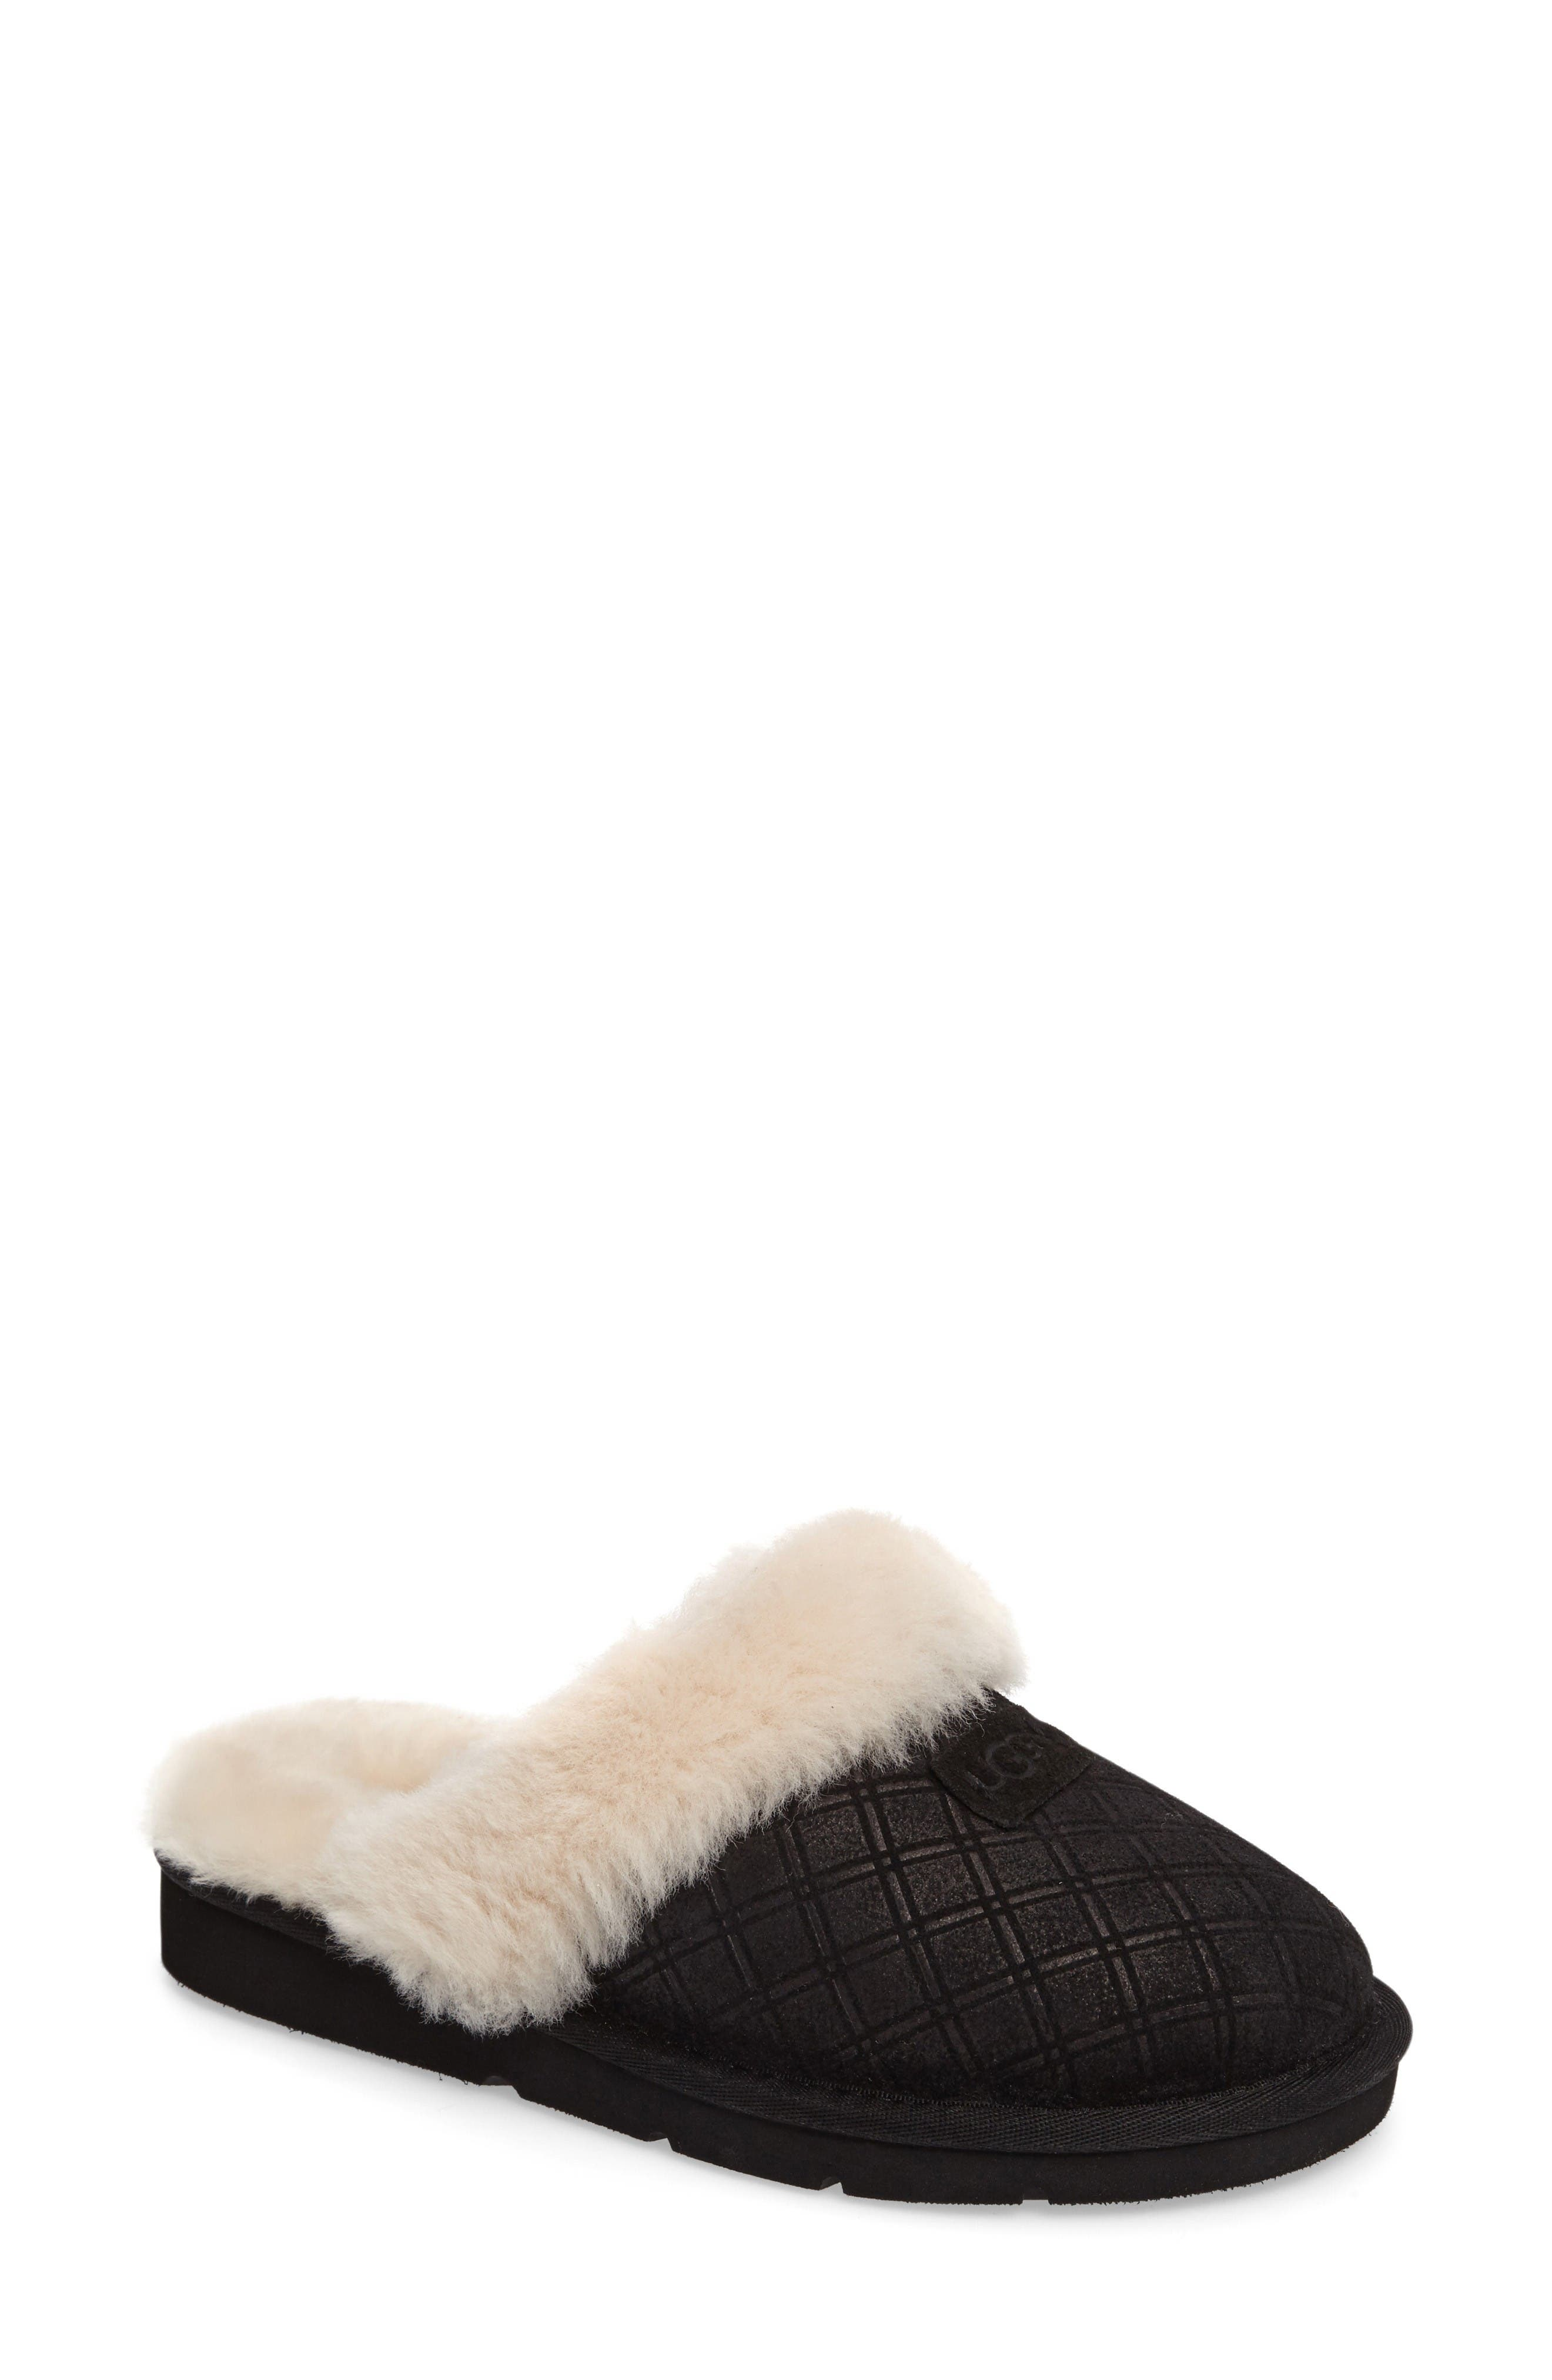 Main Image - UGG® Cozy Genuine Shearling Slipper (Women)